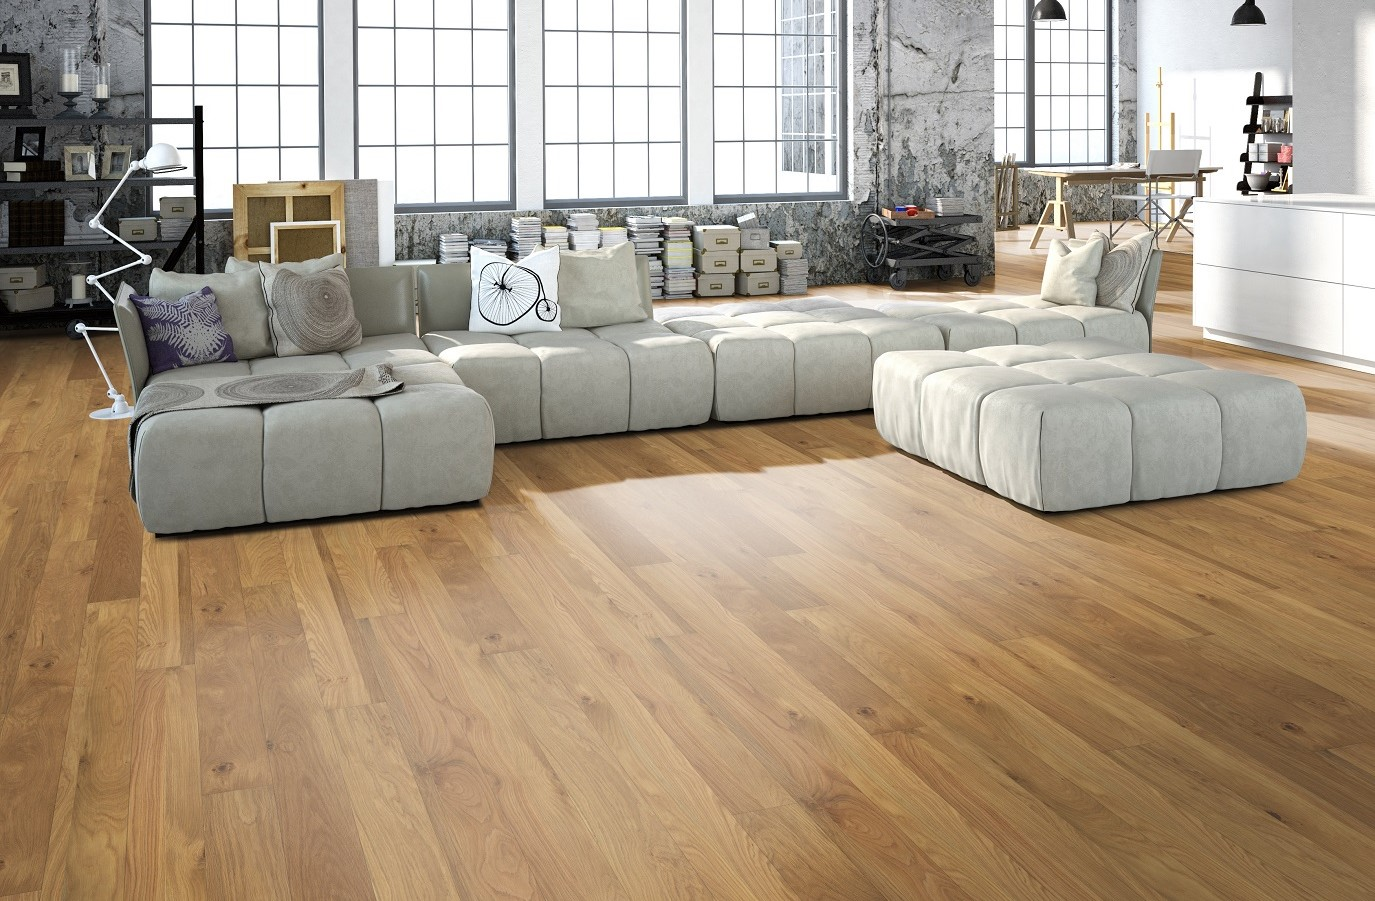 Parquet flotante Trend Real Wood